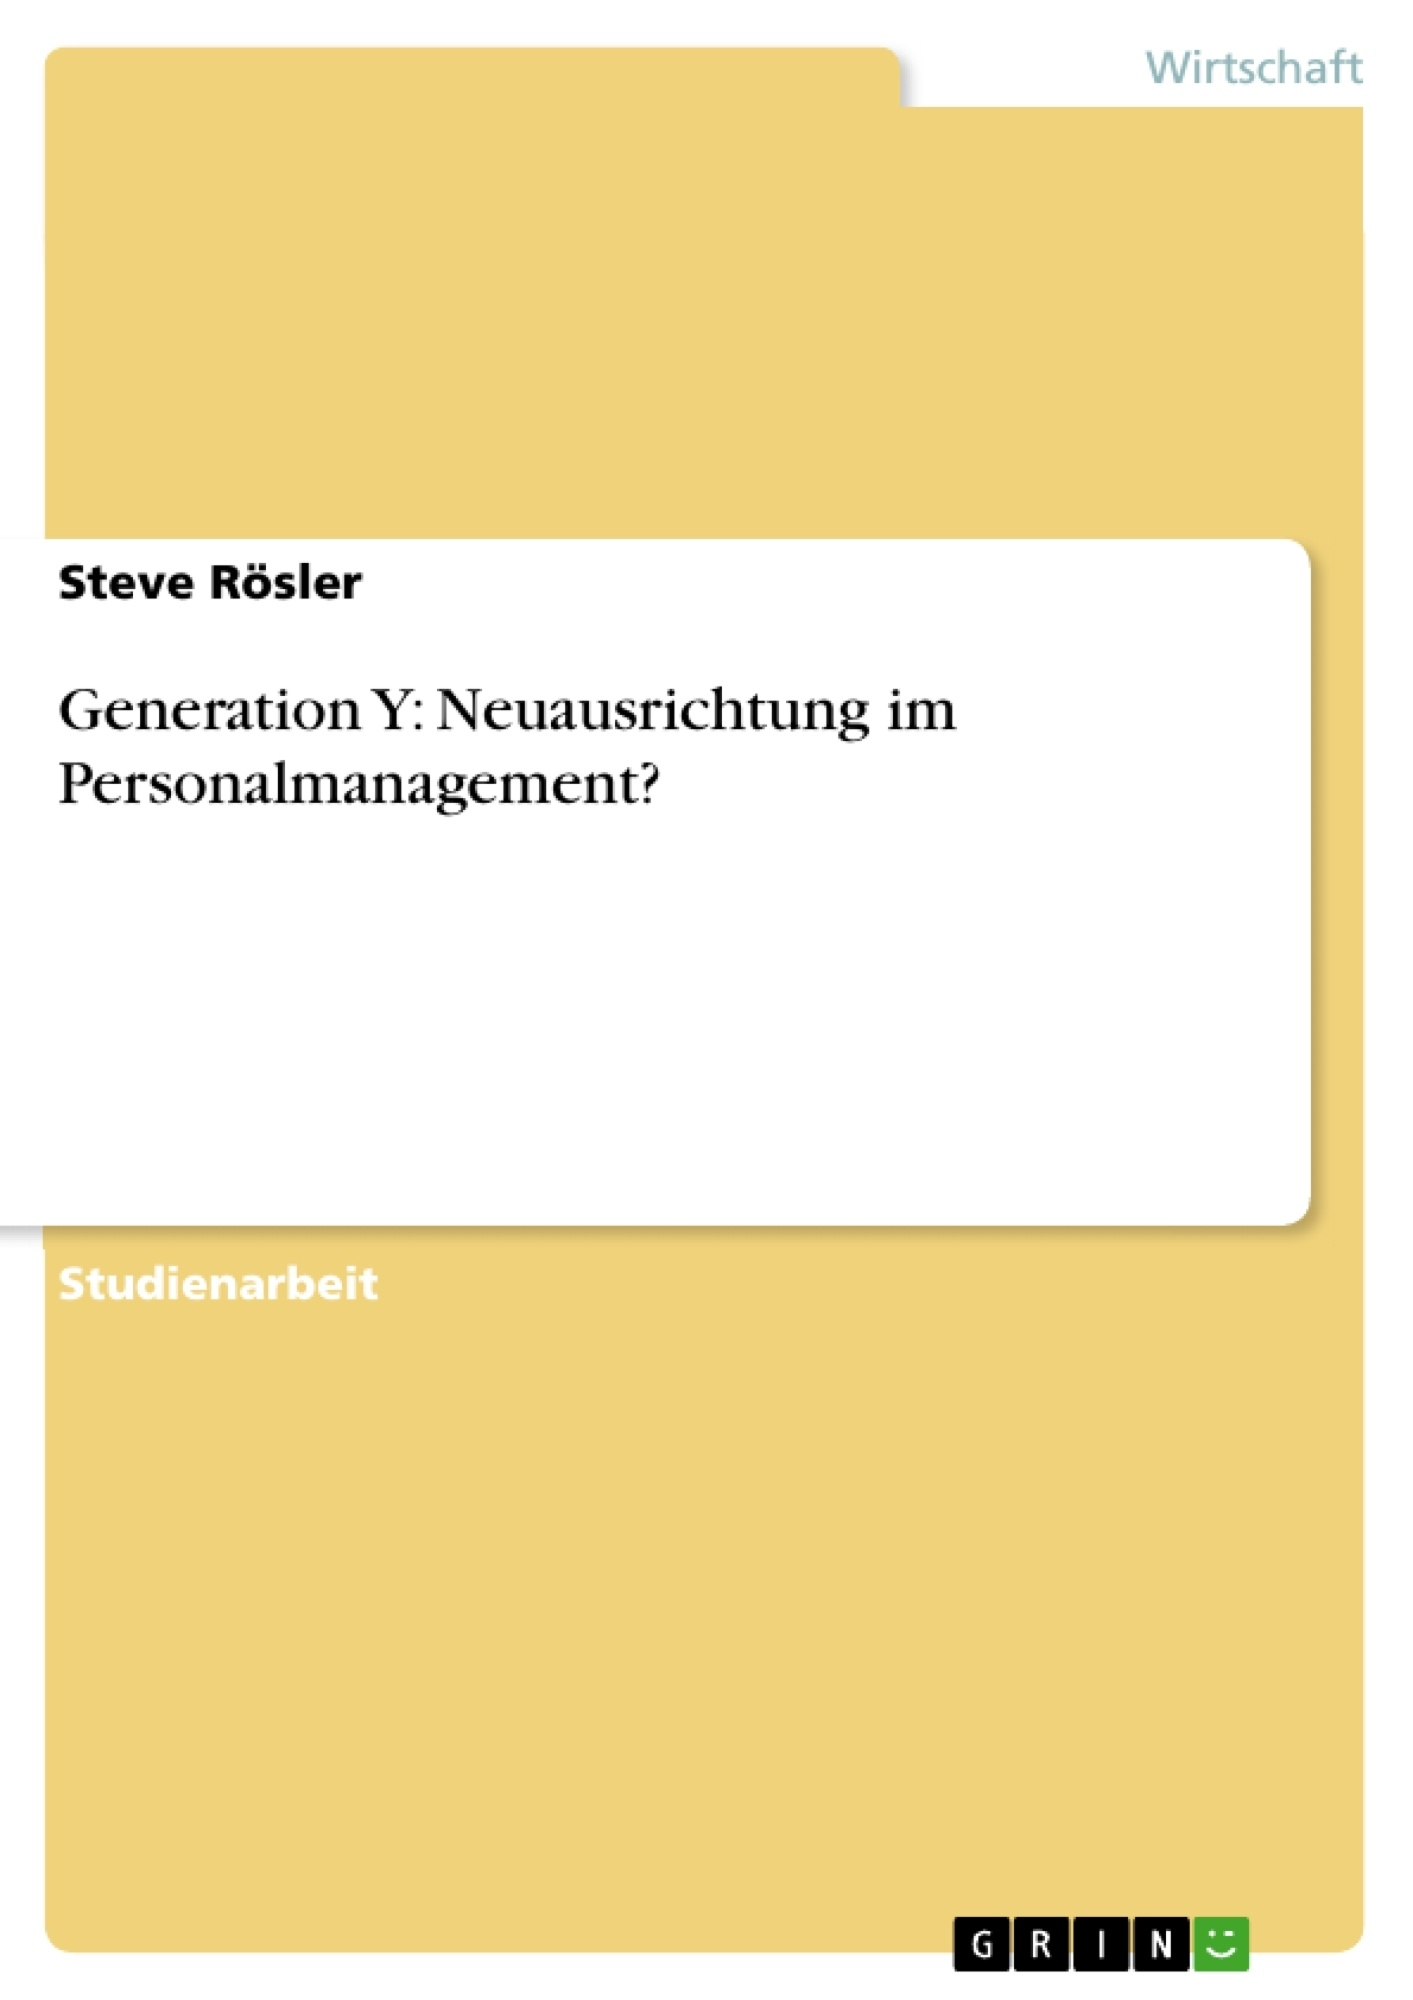 Titel: Generation Y: Neuausrichtung im Personalmanagement?